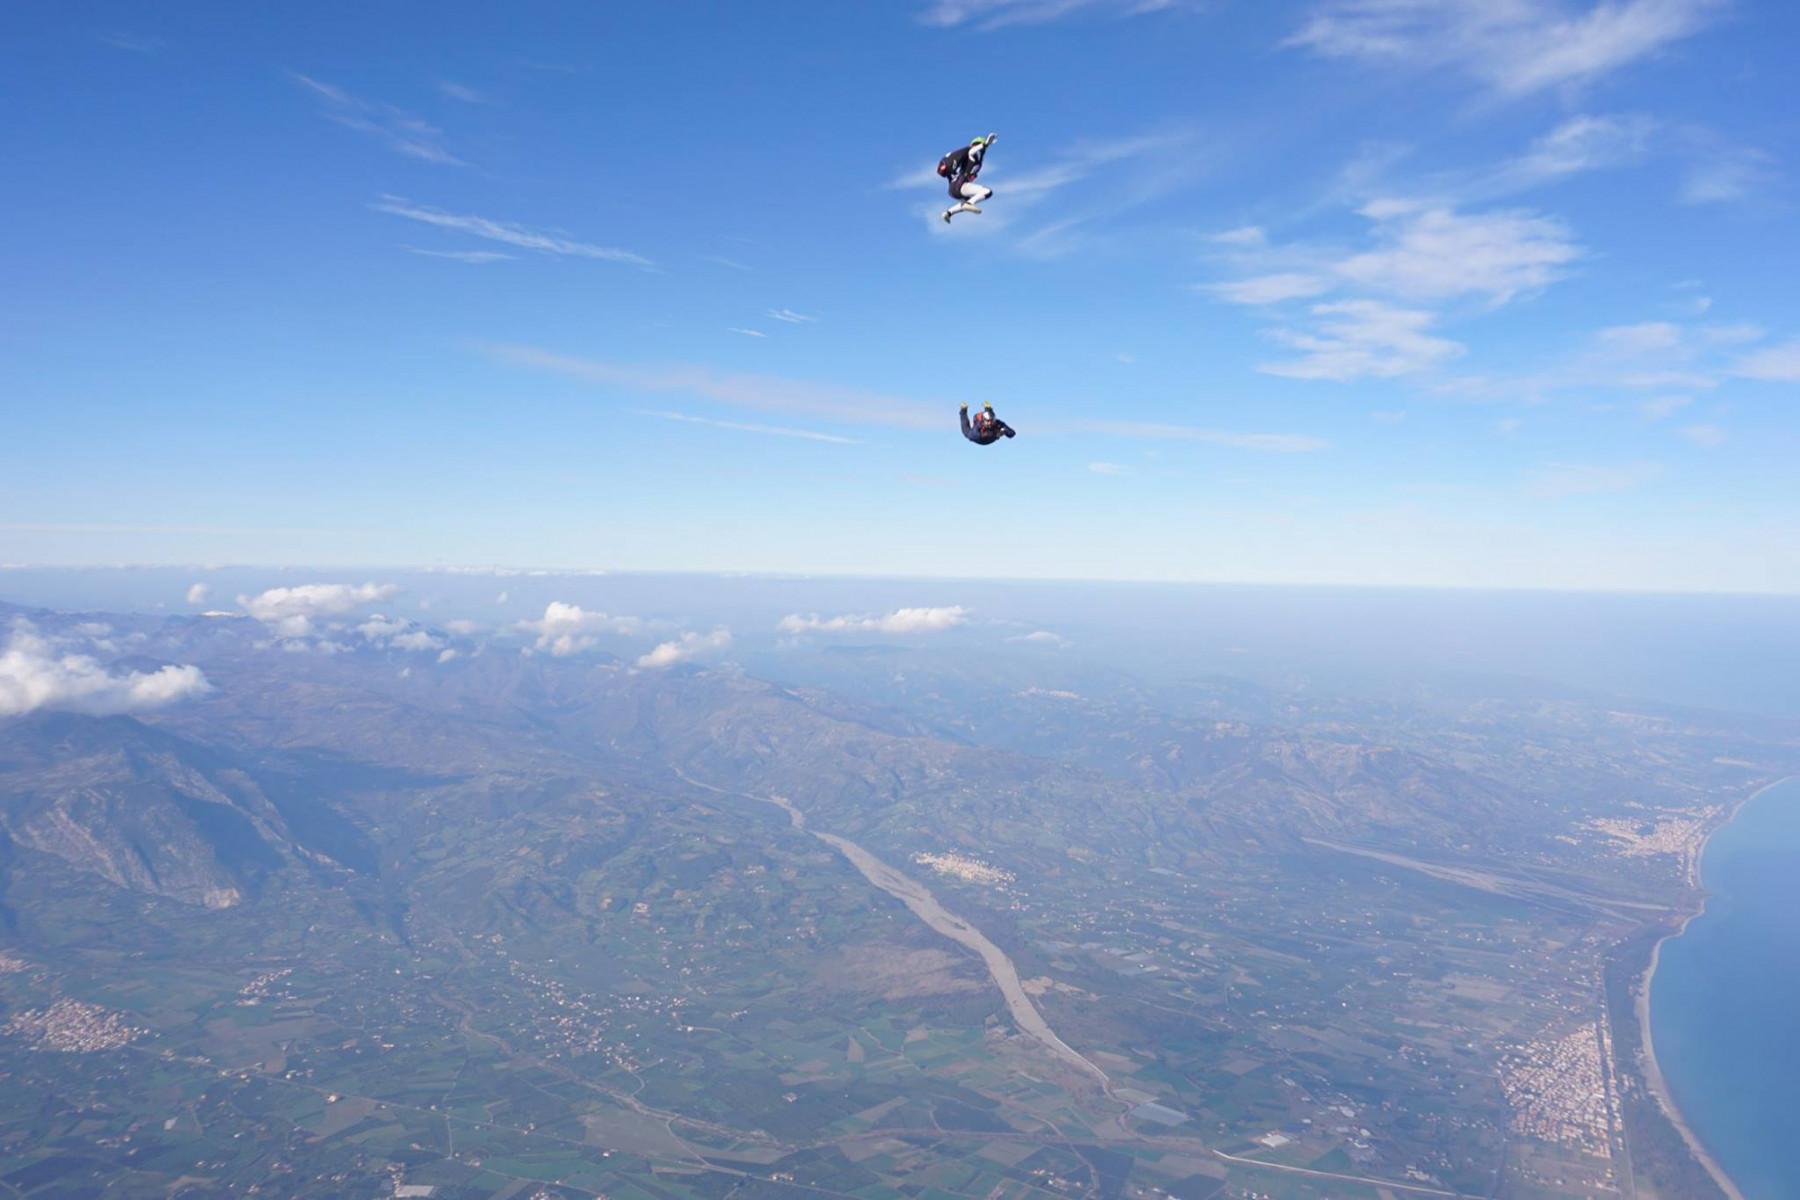 Lancio in tandem con paracadute sul Golfo di Sibari (CS)